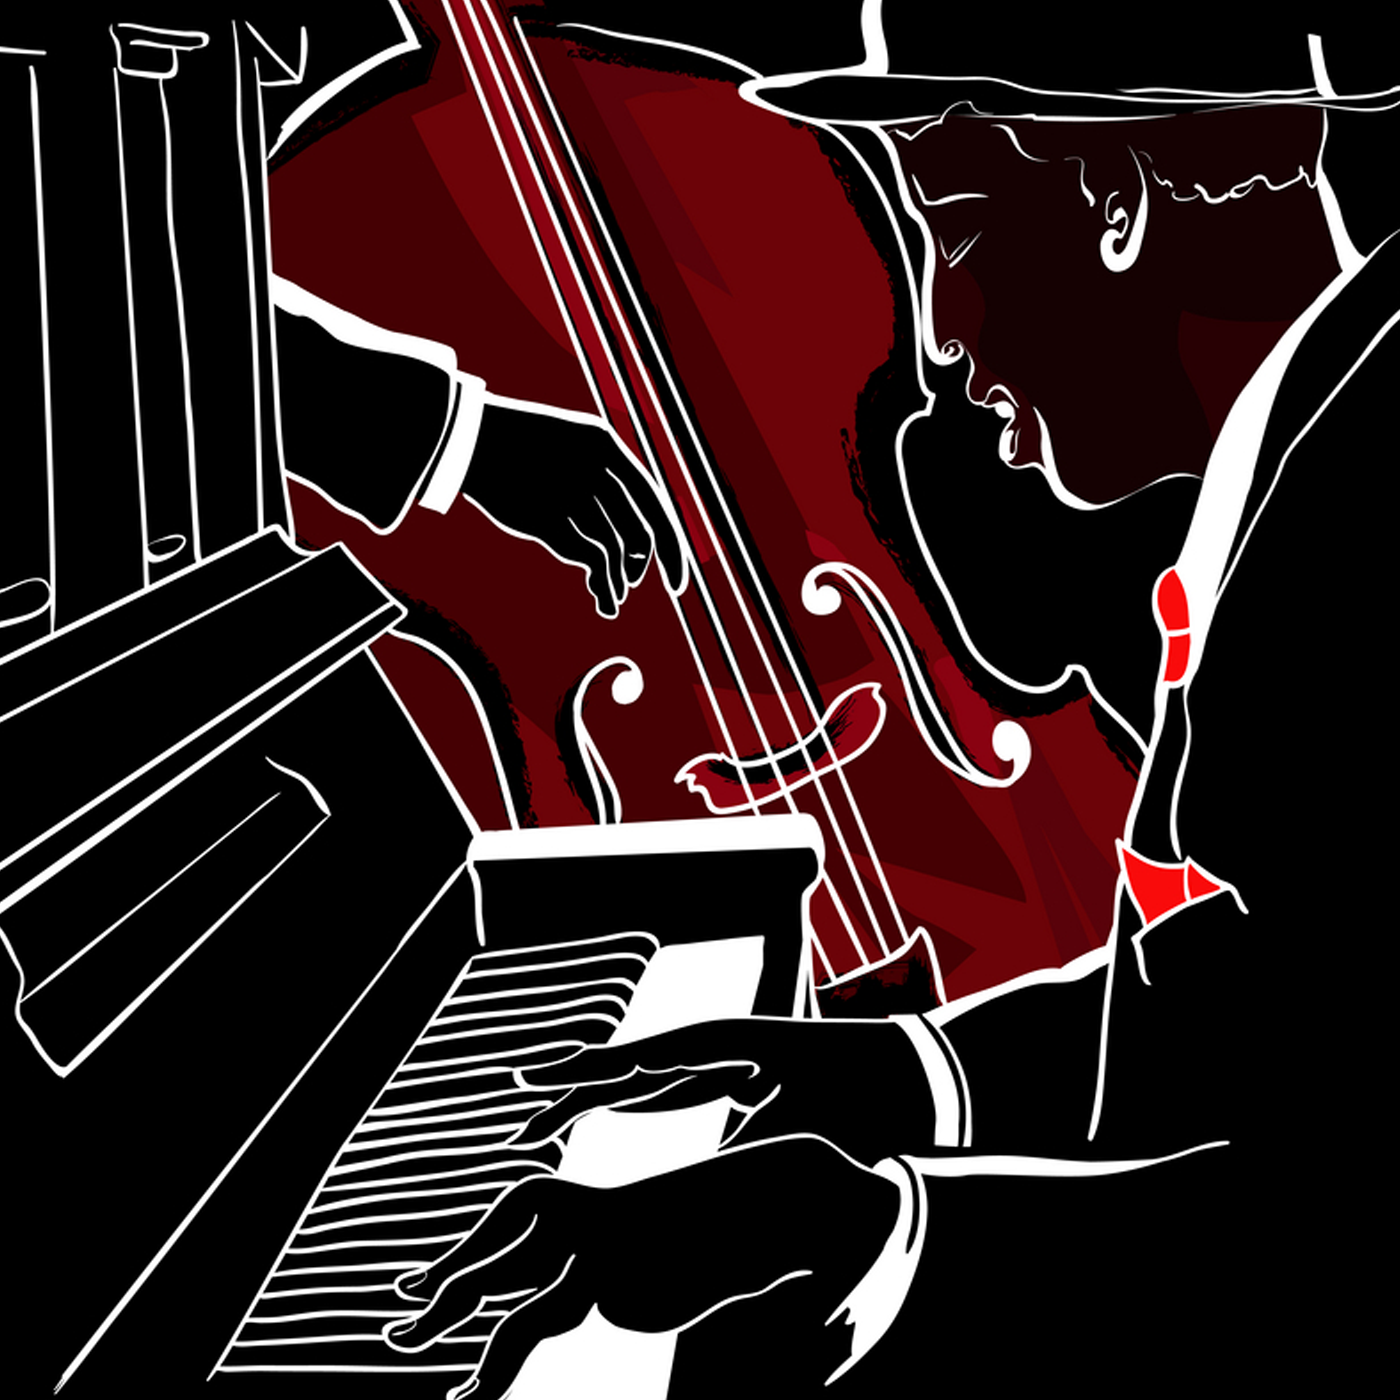 Contemporary Classic Bass Jazz On Jazzradio Com Jazzradio Com Enjoy Great